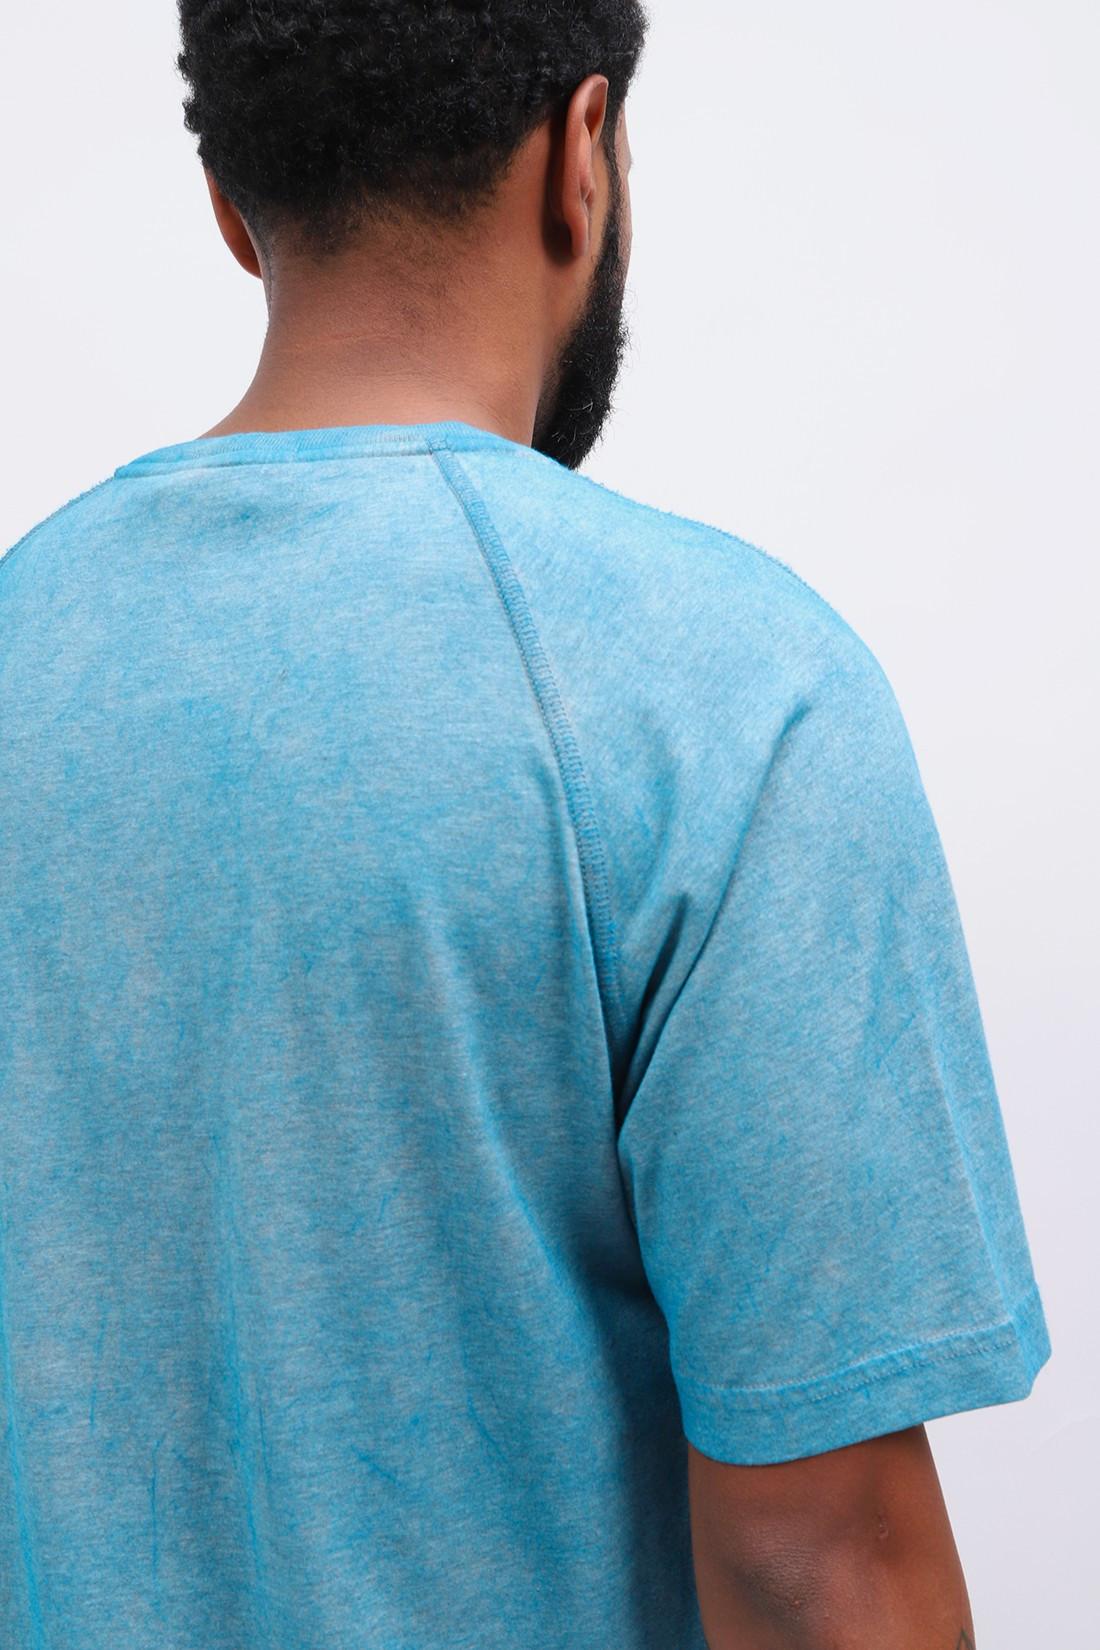 STONE ISLAND / 22993 dust t-shirt v1m42 Turchese